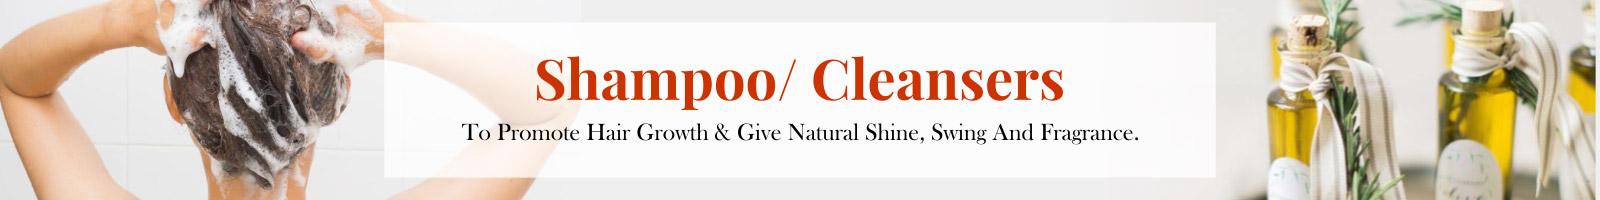 Shampoo/ Cleansers